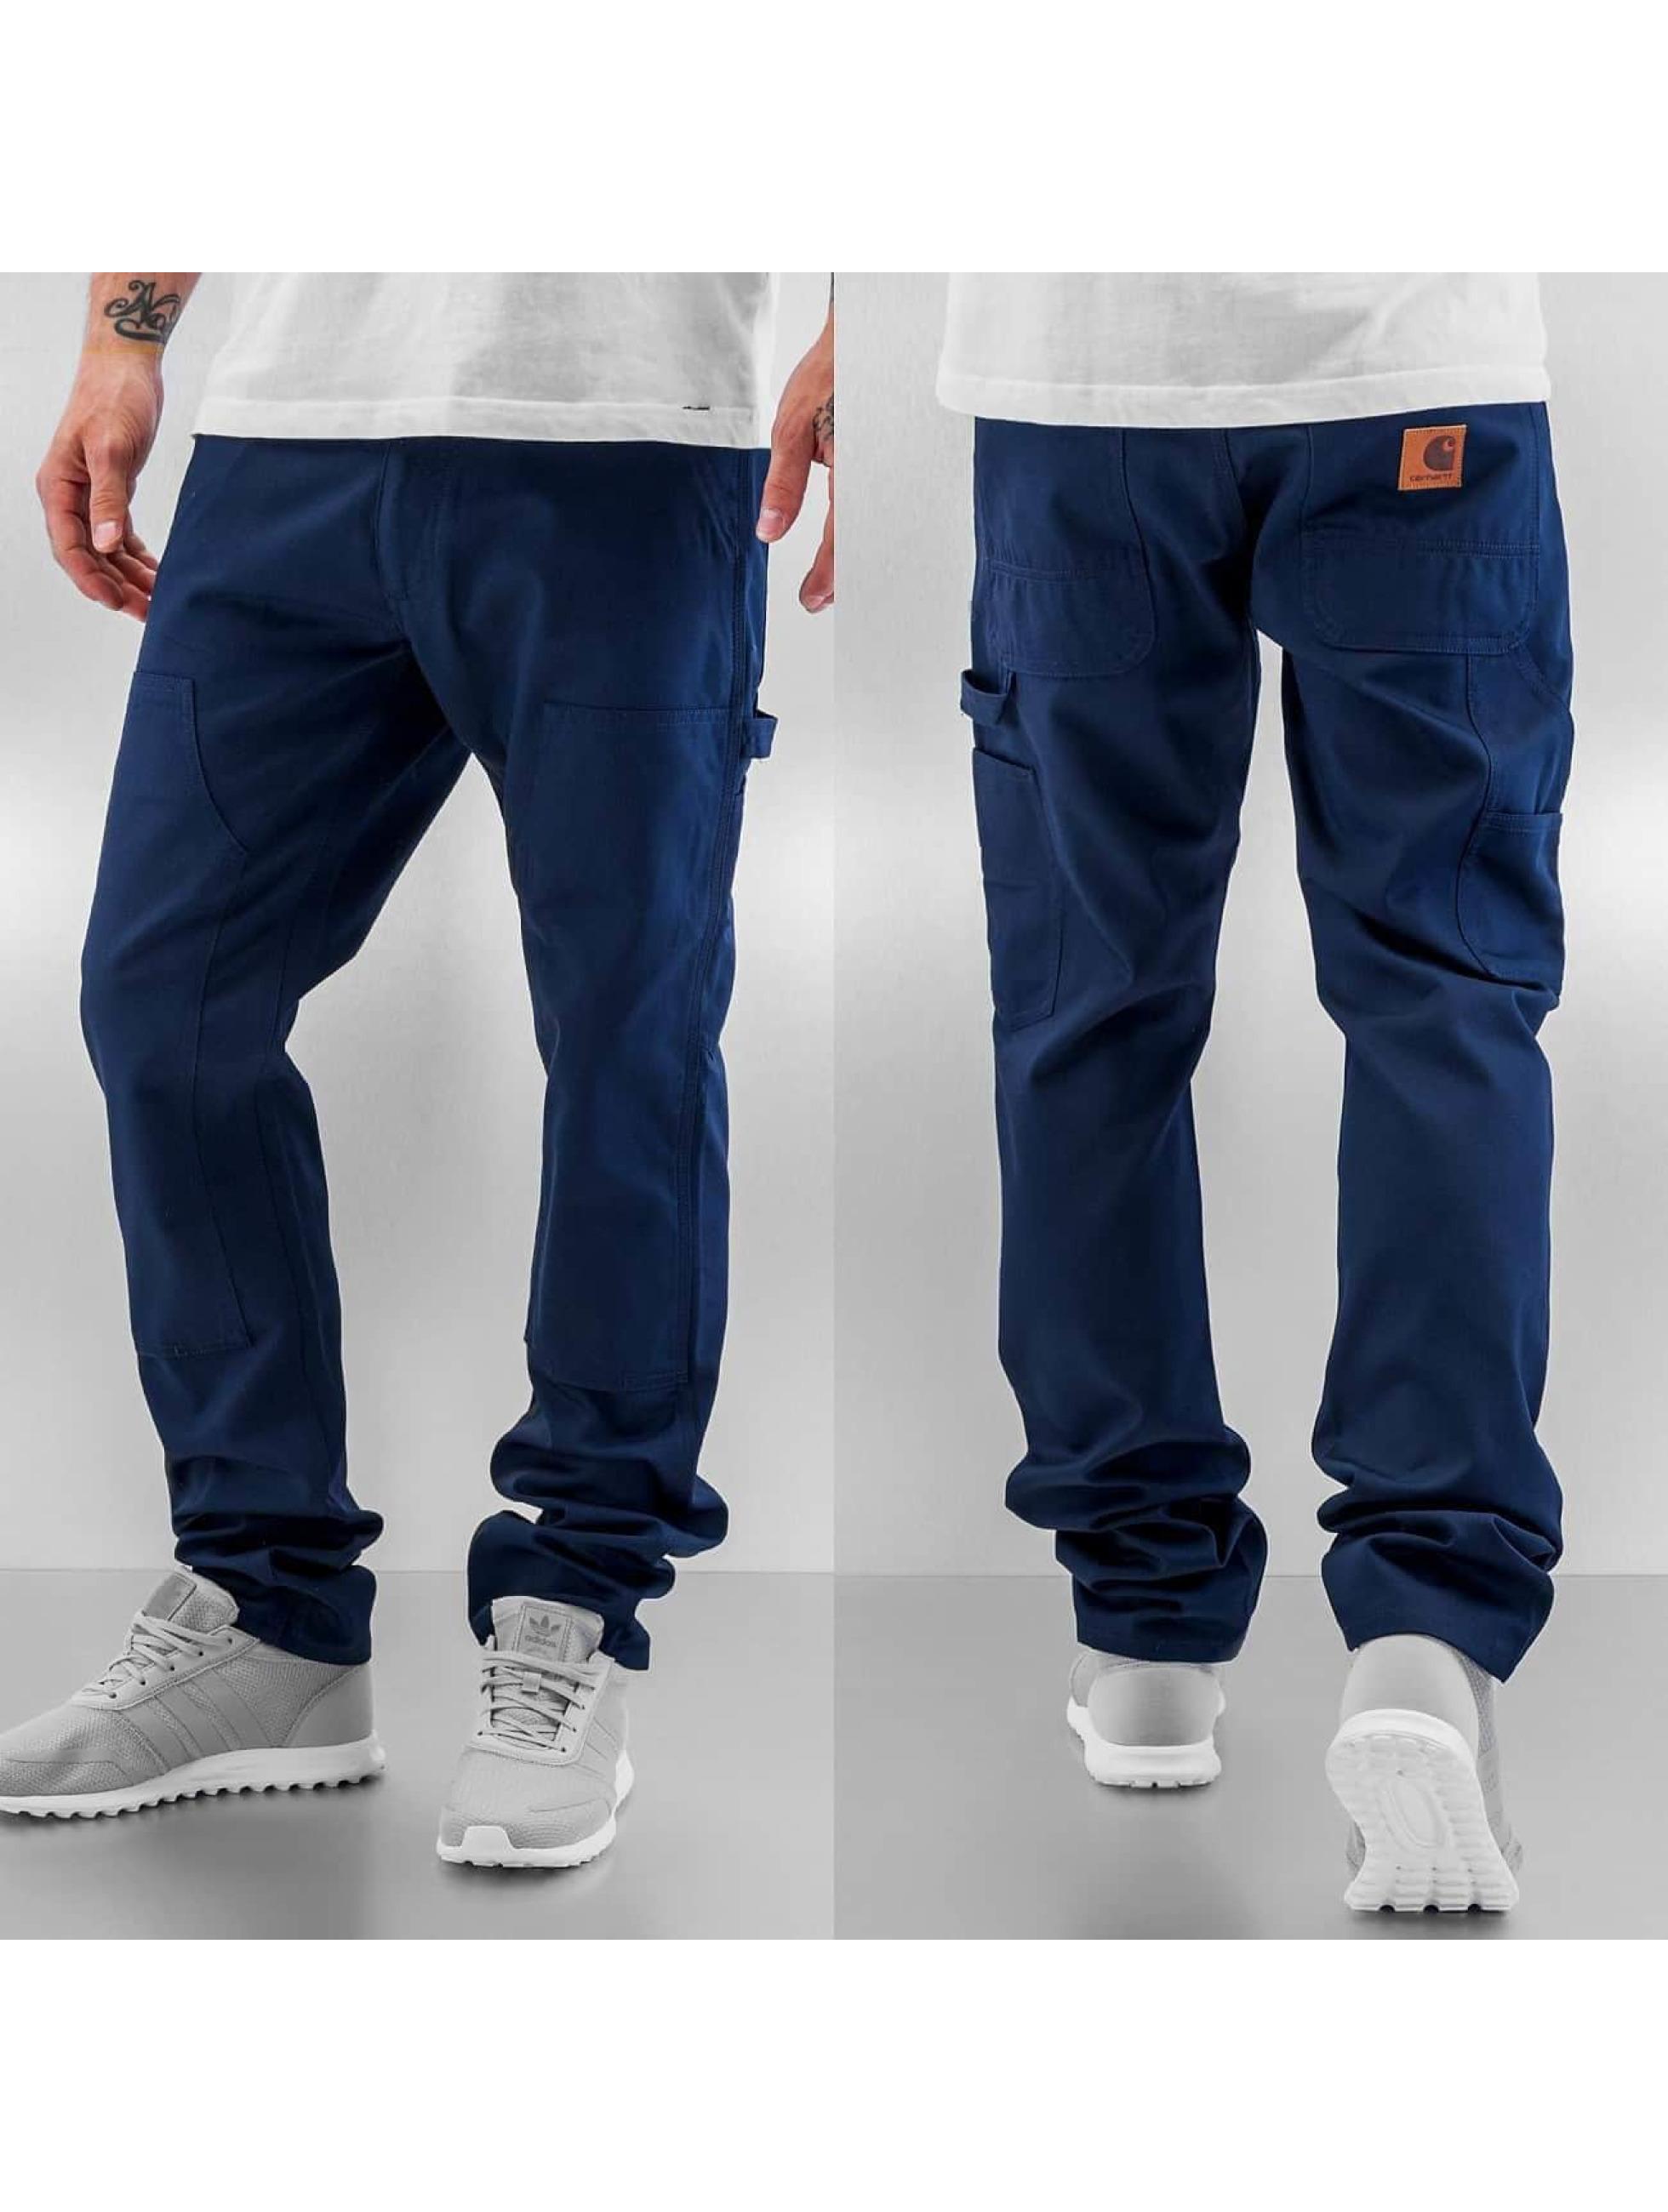 Carhartt WIP Джинсы прямого покроя Lincoln Double Knee синий